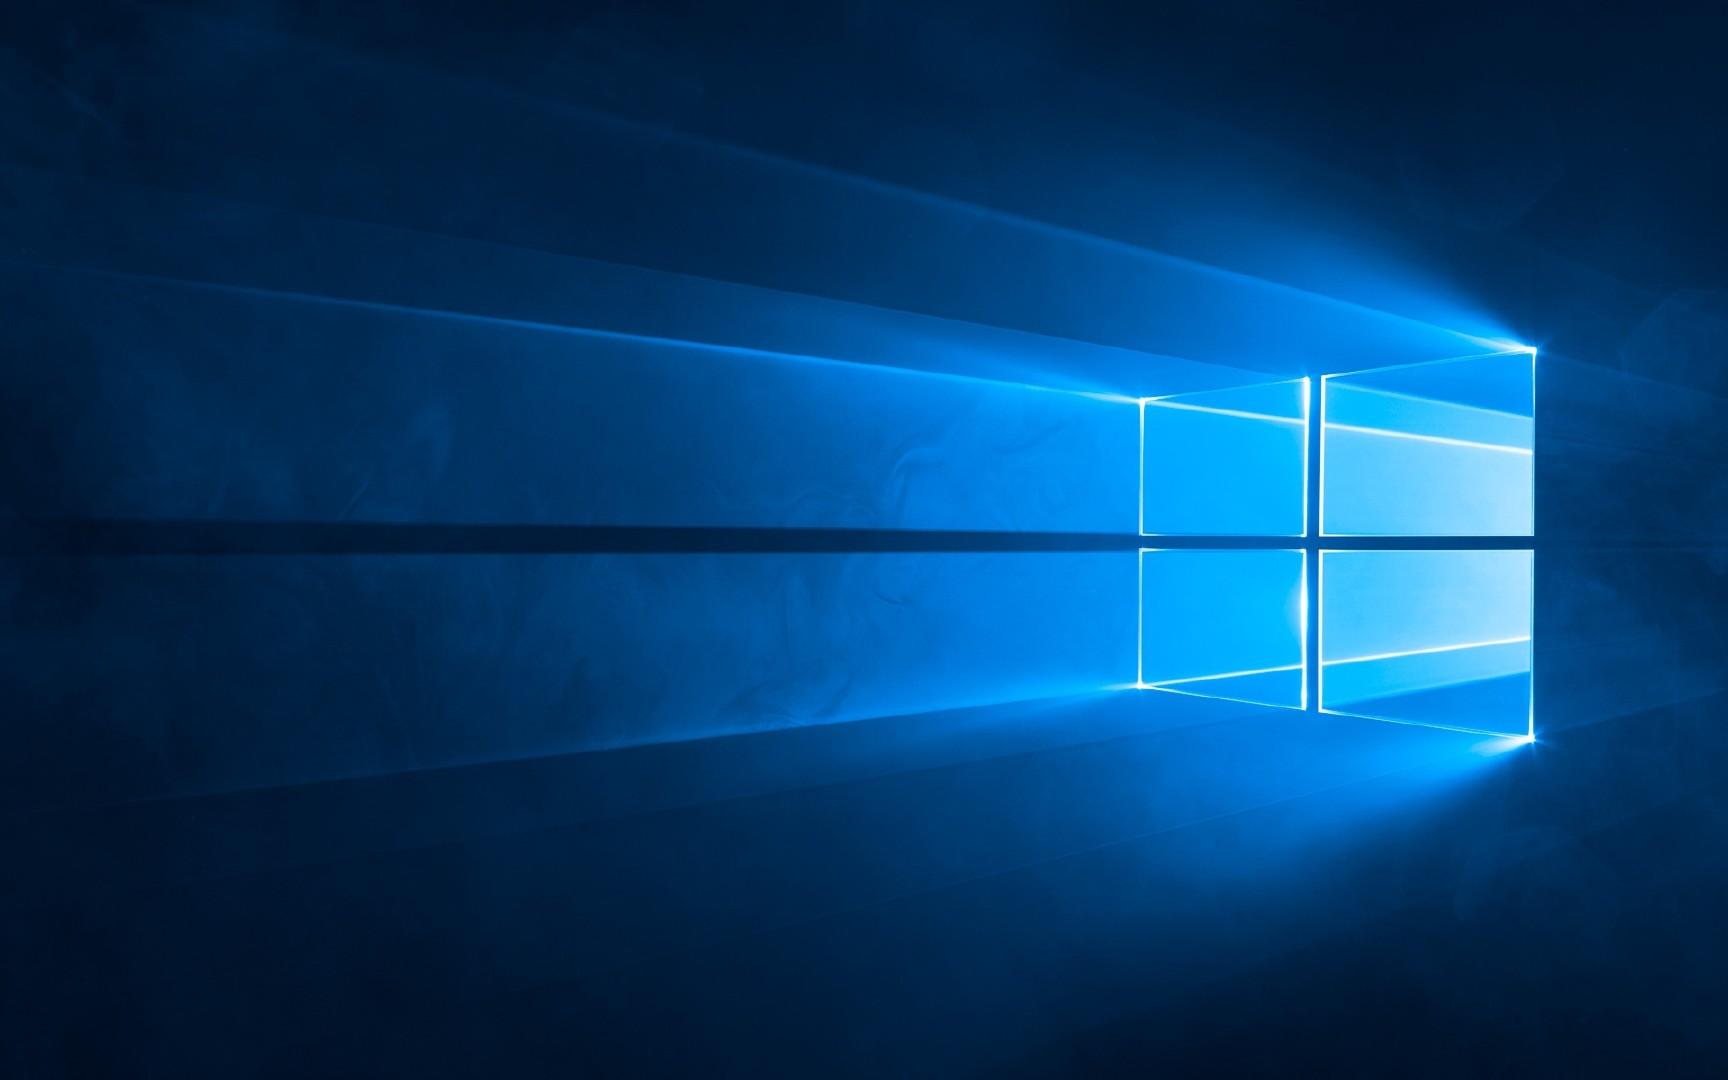 Hi Tech 10 Windows Technology PicsFabcom   Desktop Wallpapers 1728x1080